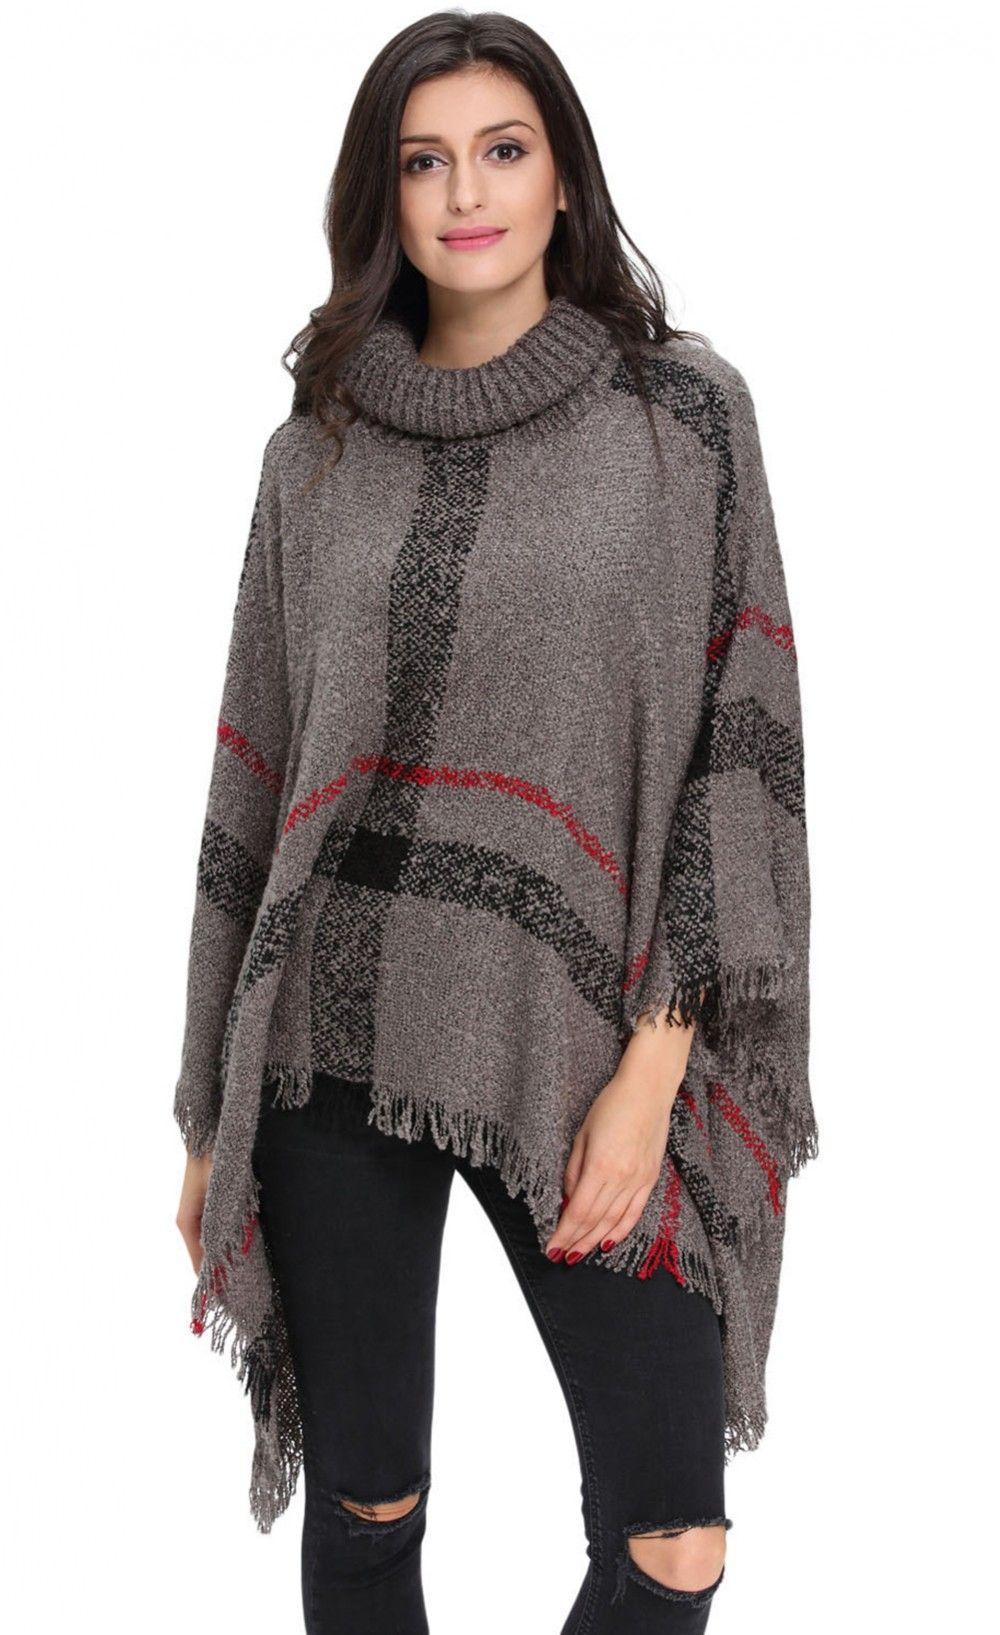 fc9466129 Gray Turtleneck Tassel Cape Sweater | STreet SWag! | Pullover ...